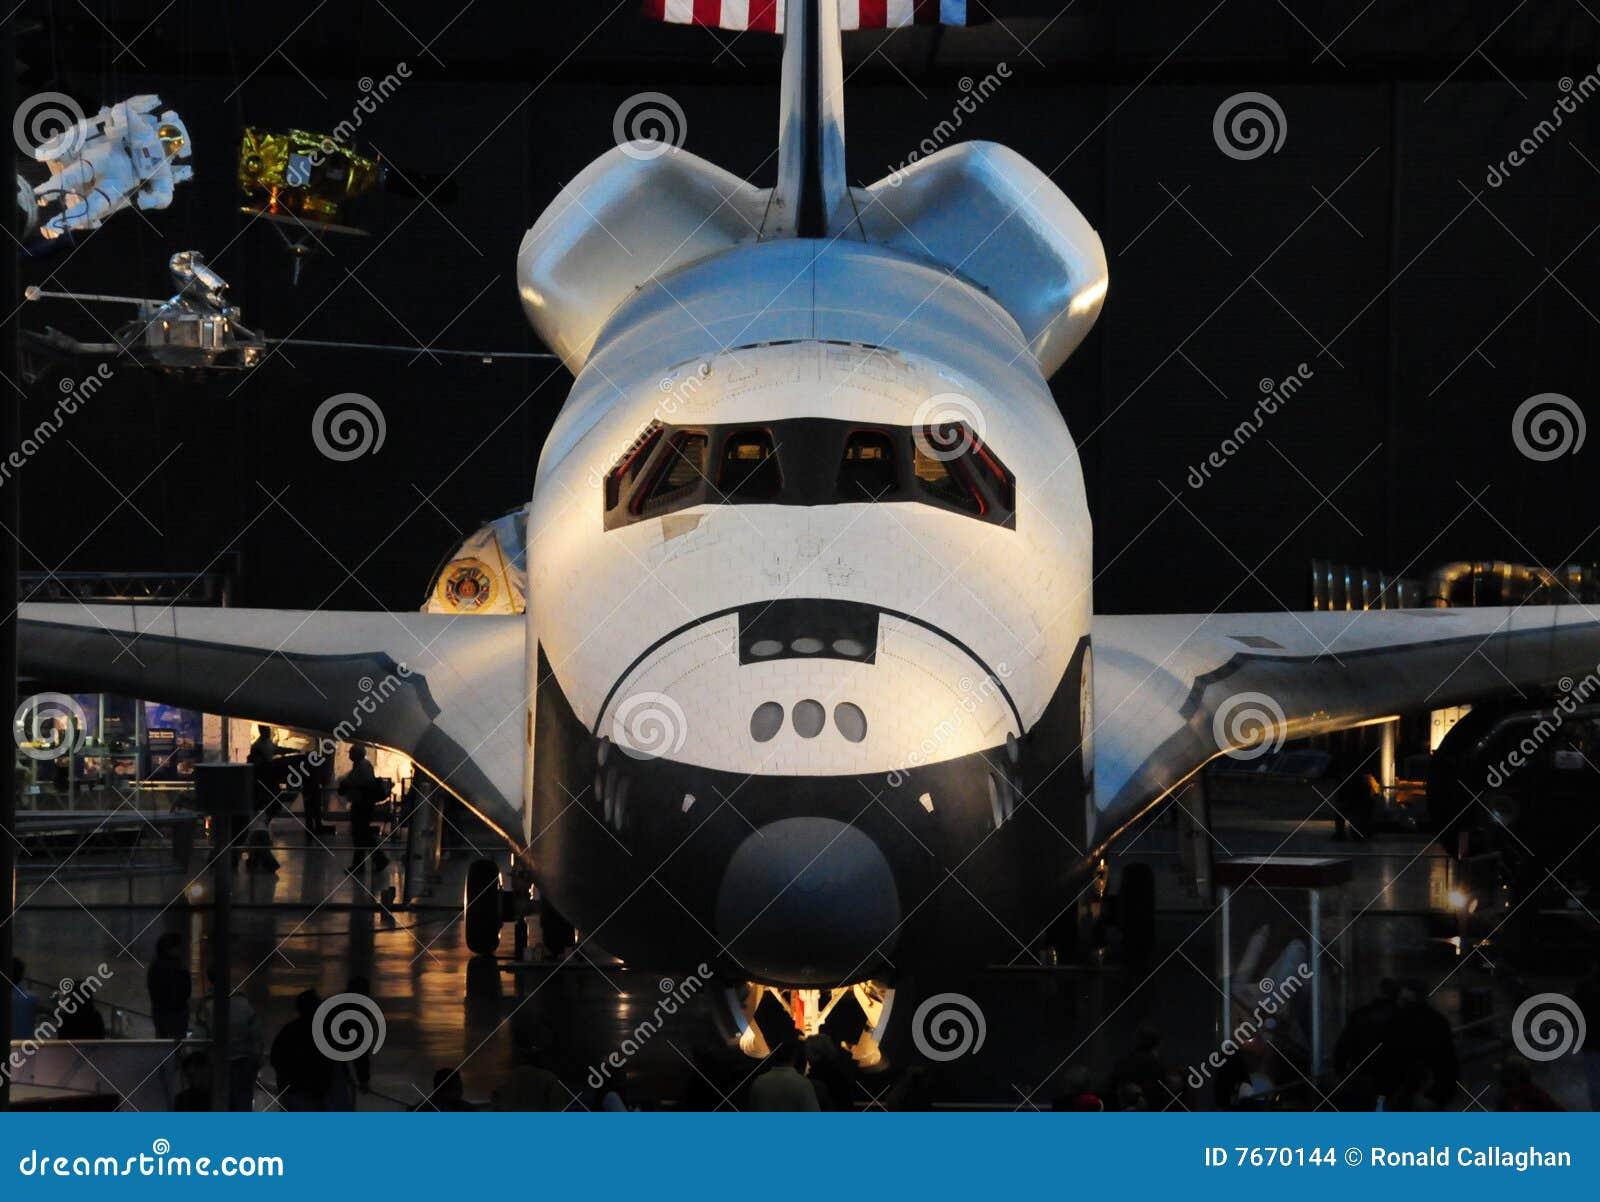 us space shuttle l - photo #4